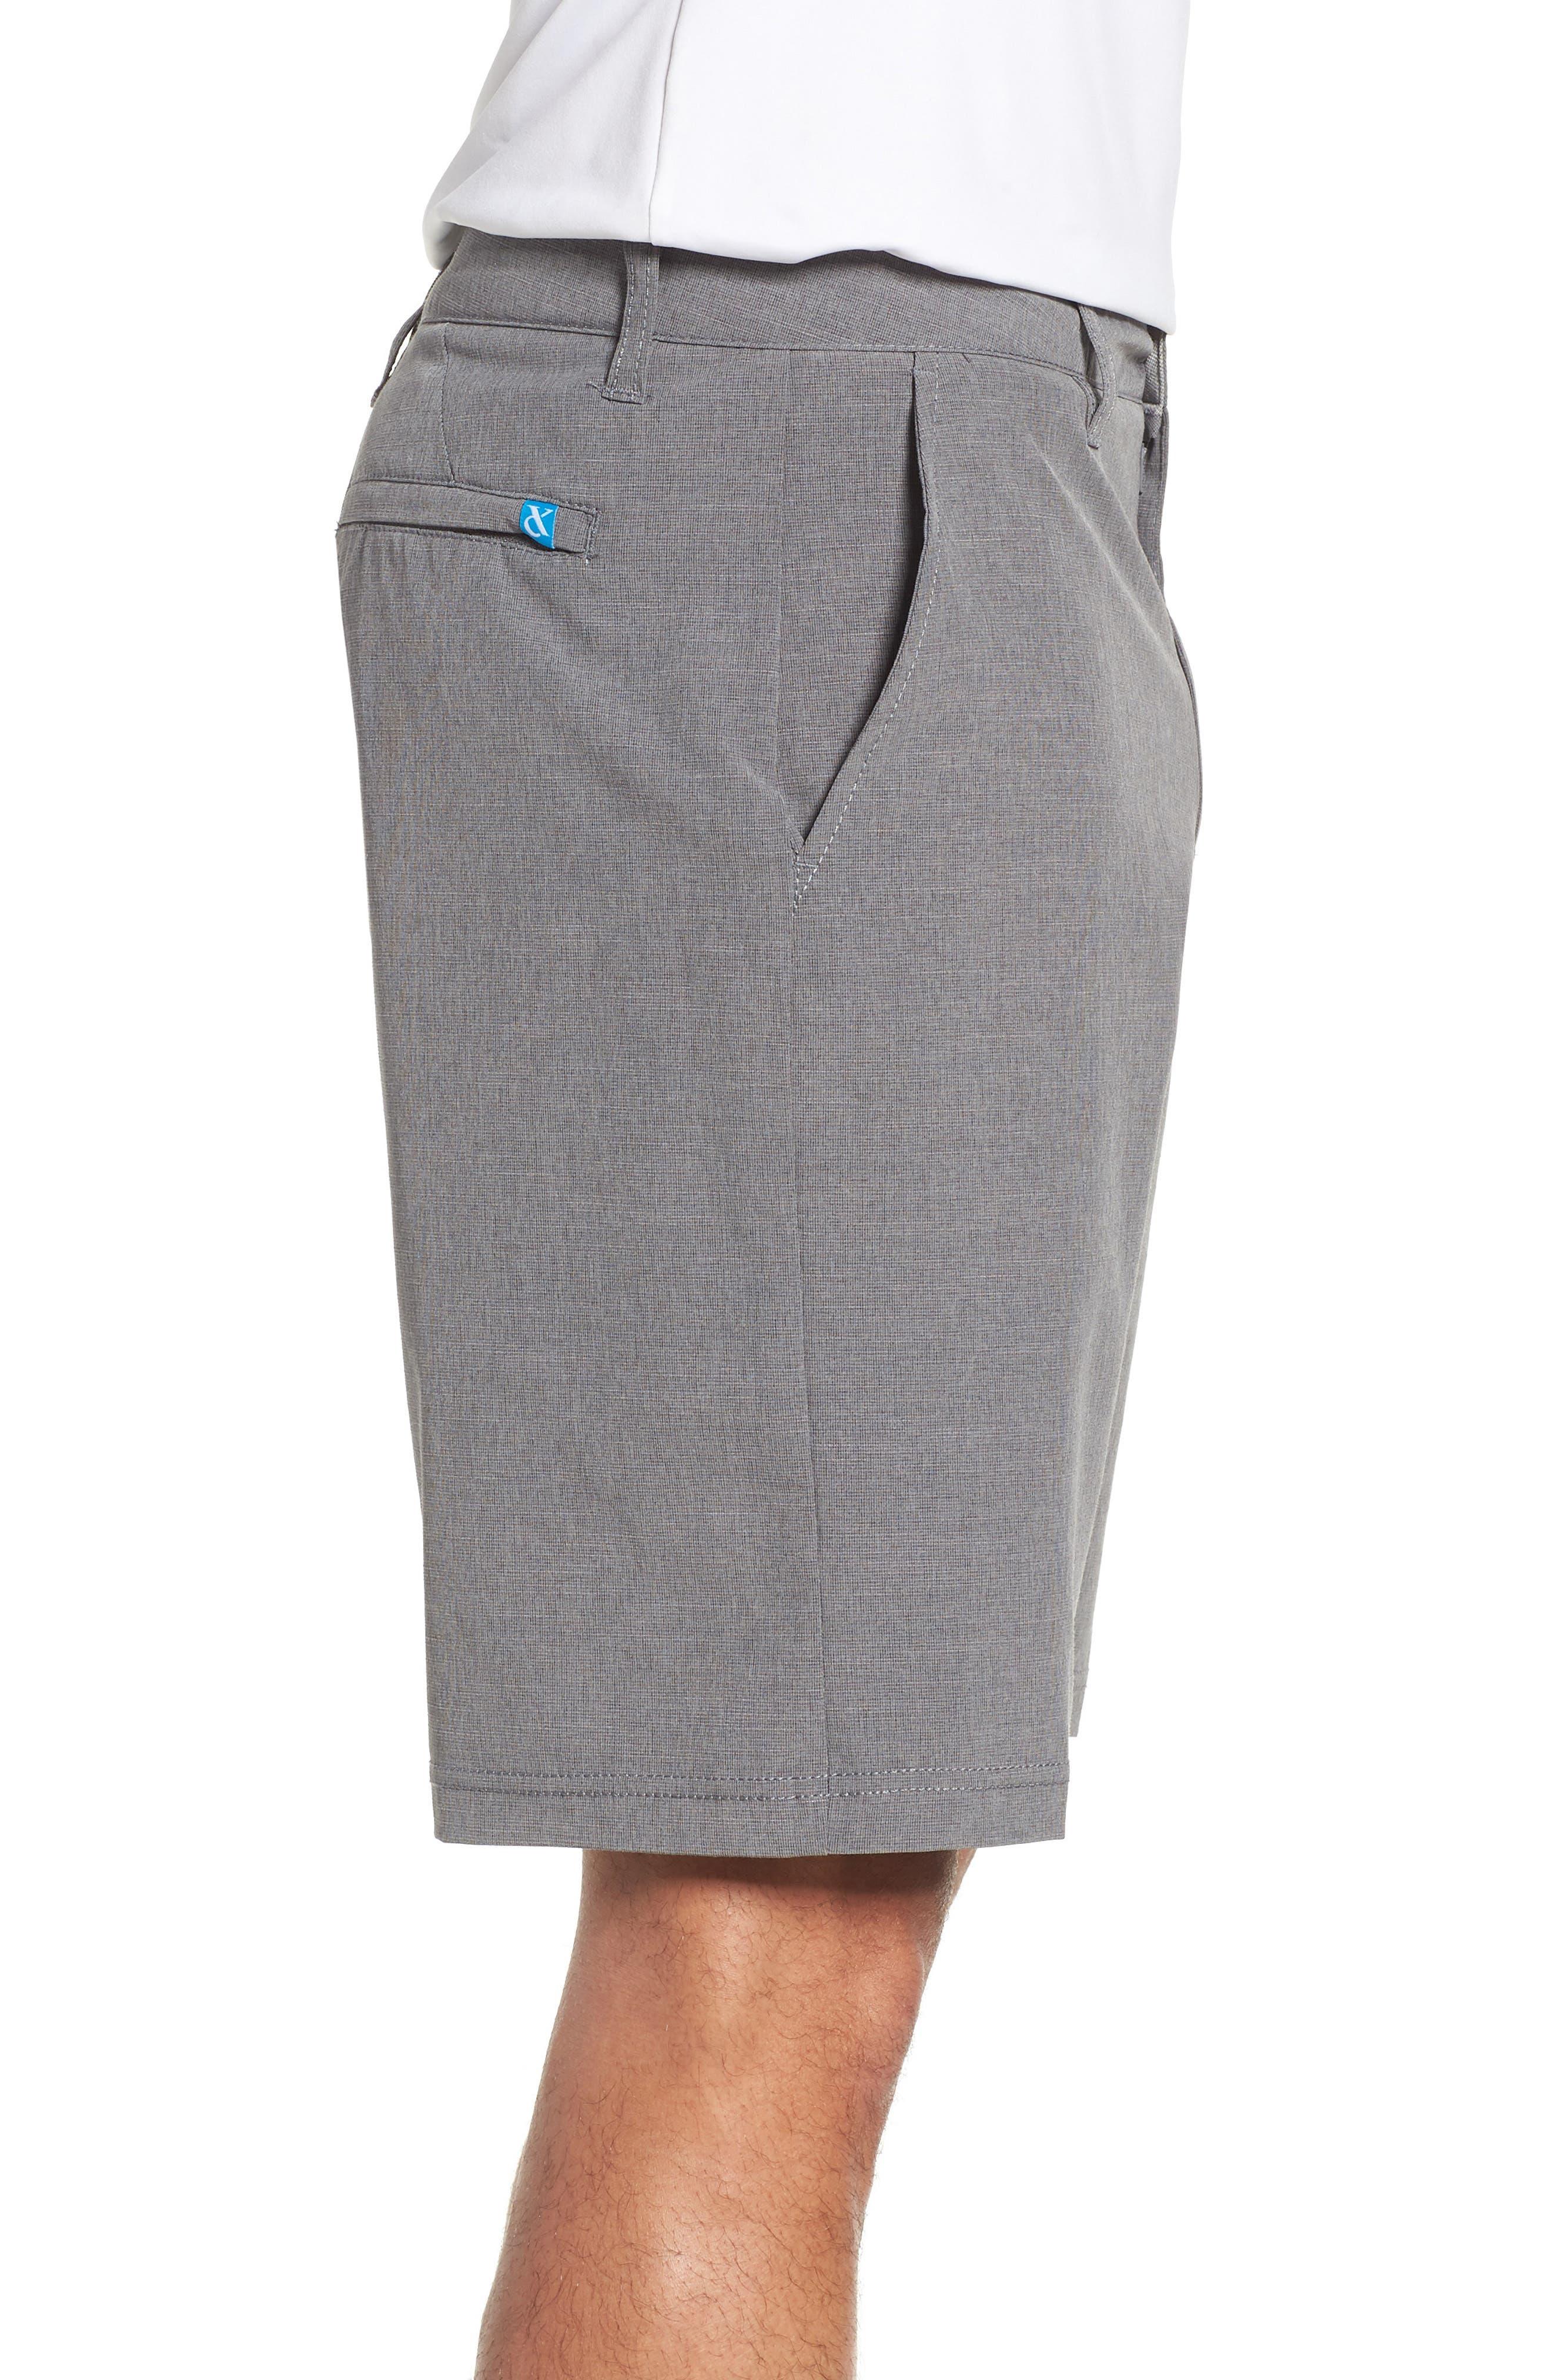 DEVEREUX, Cruiser Hybrid Shorts, Alternate thumbnail 3, color, CHARCOAL